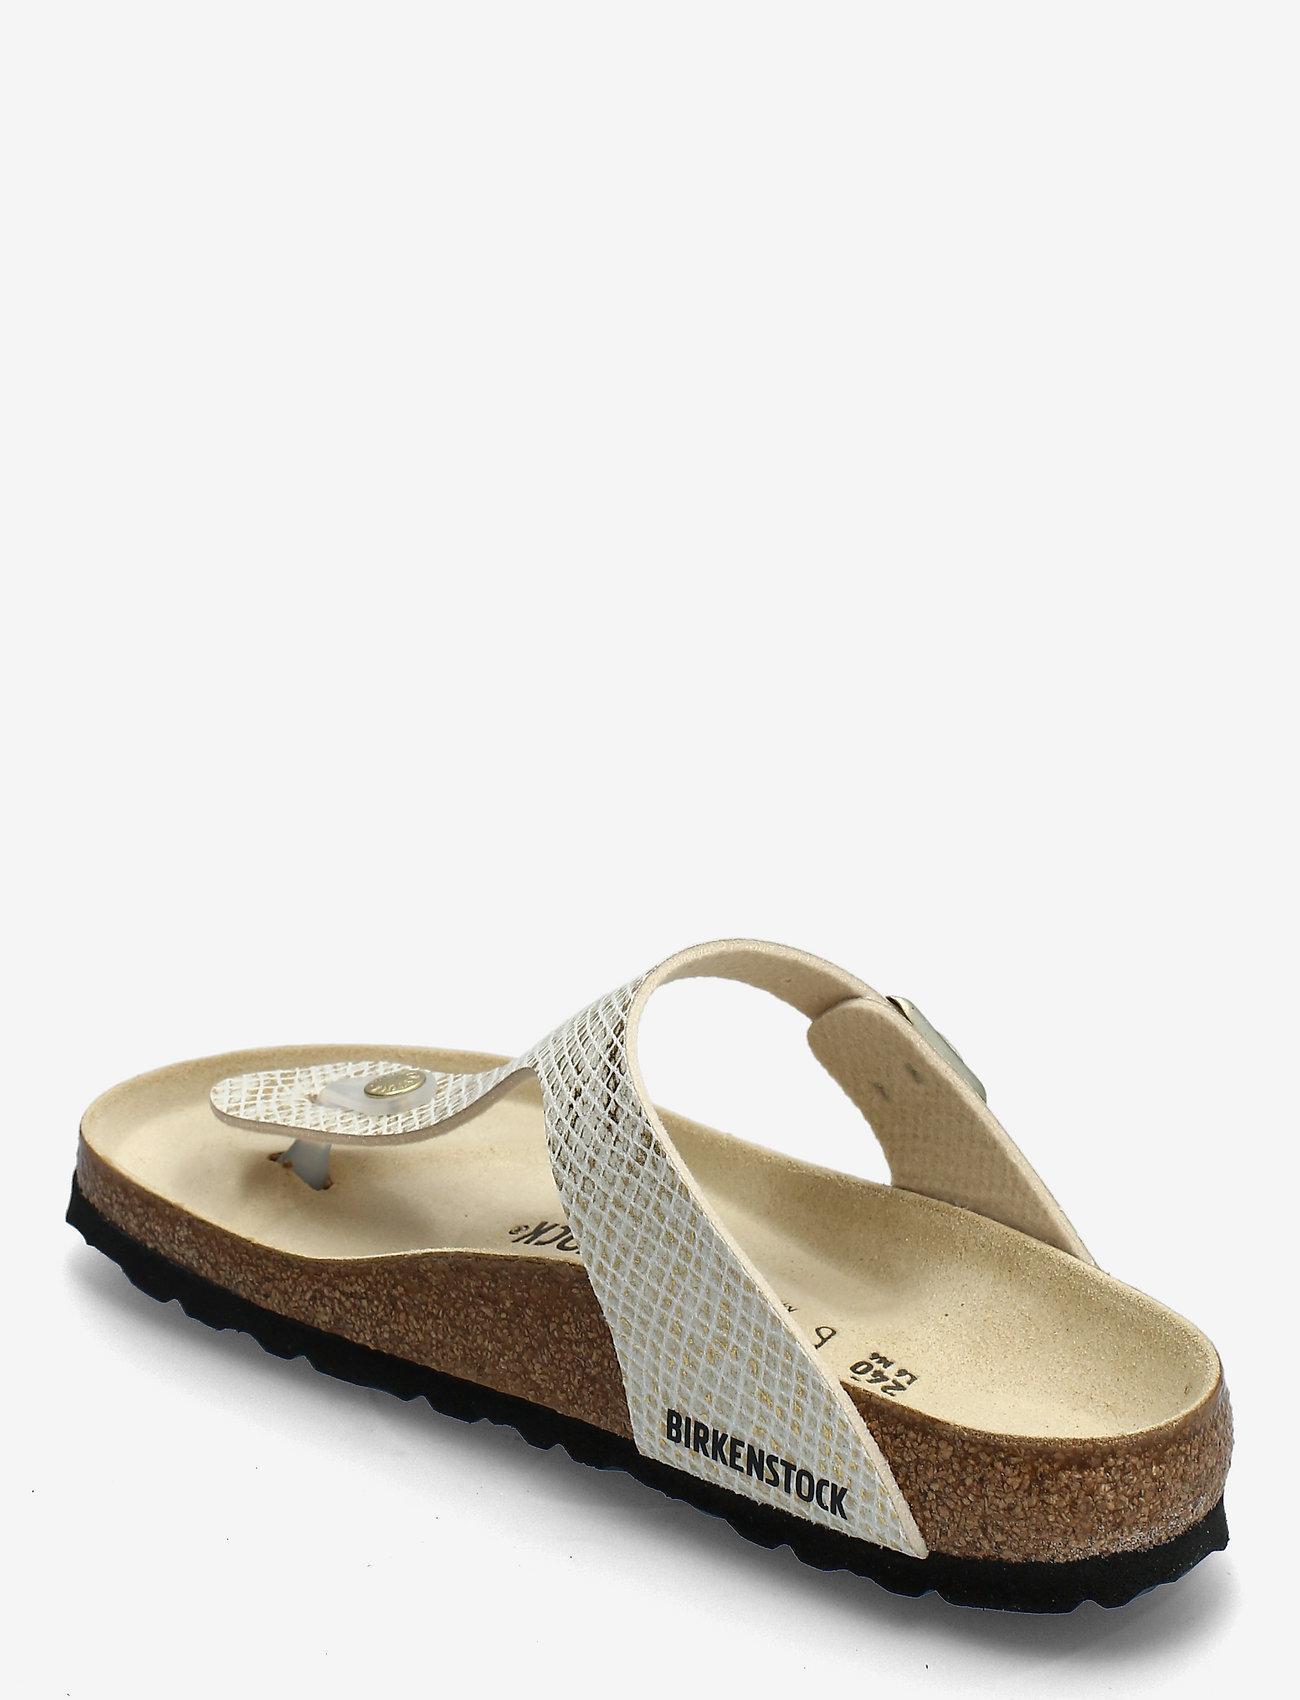 Birkenstock - Gizeh - flade sandaler - shiny python egsehell/gold - 2